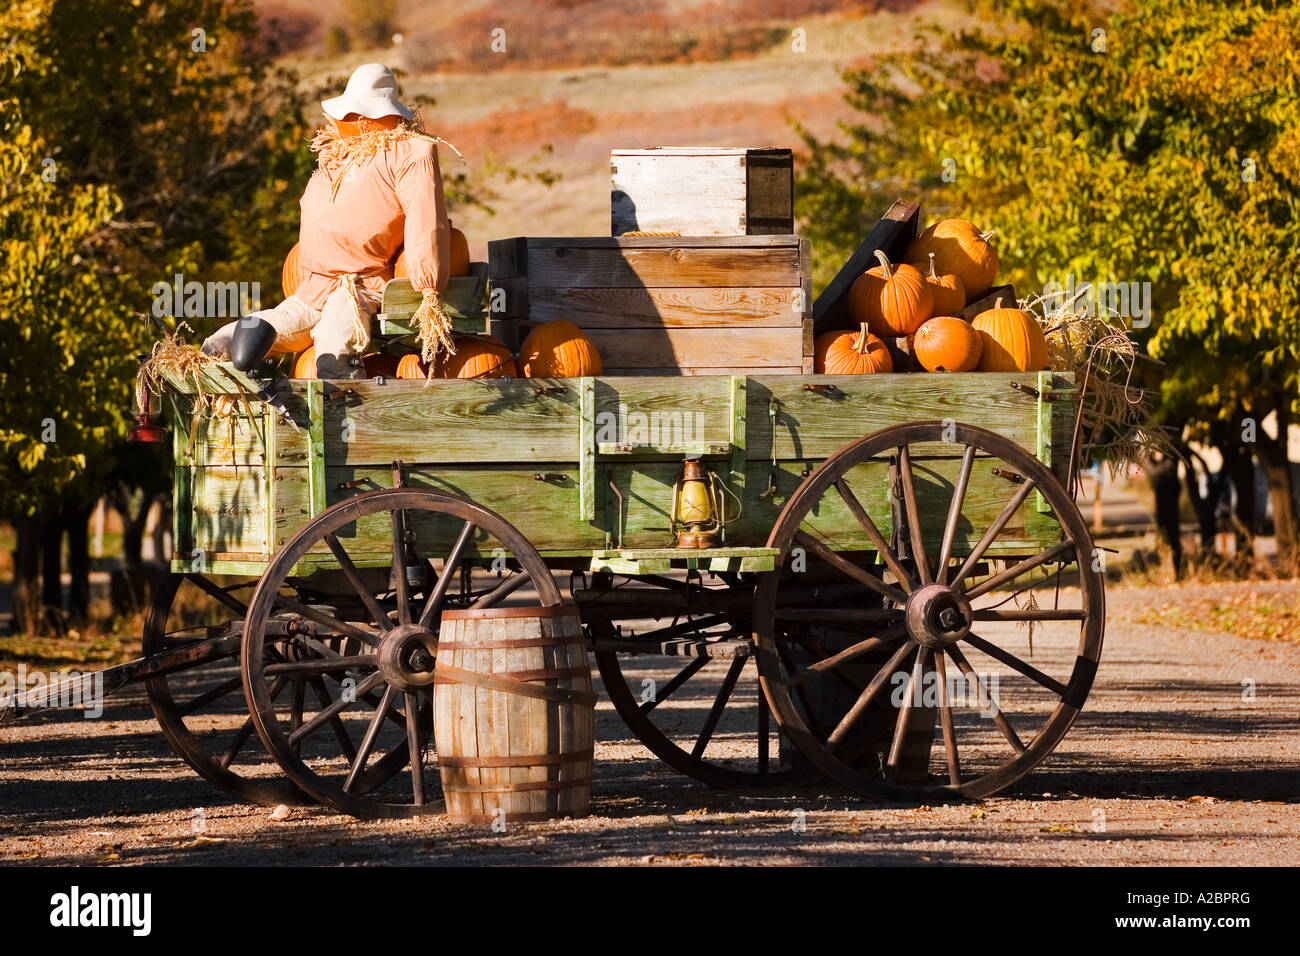 Antique Farm Wagon In Old Deseret Village In Salt Lake City